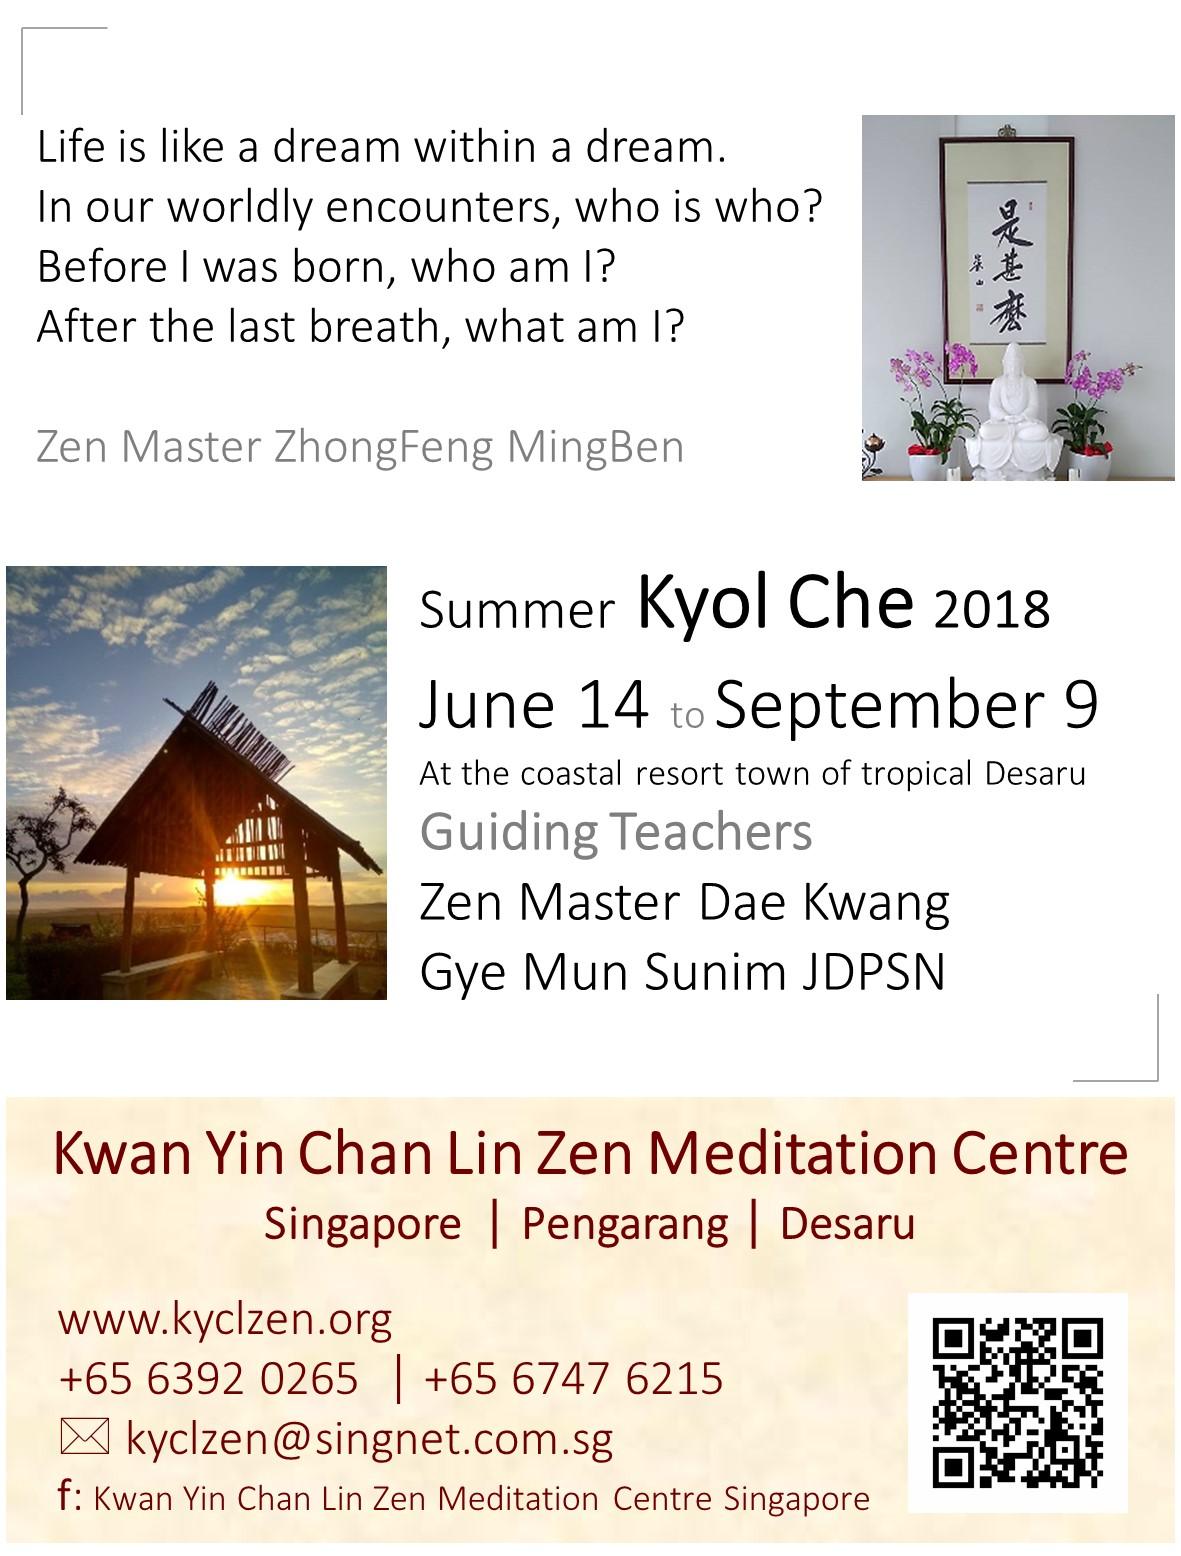 2018 summer kyol chye advertisement_vapr3.jpg